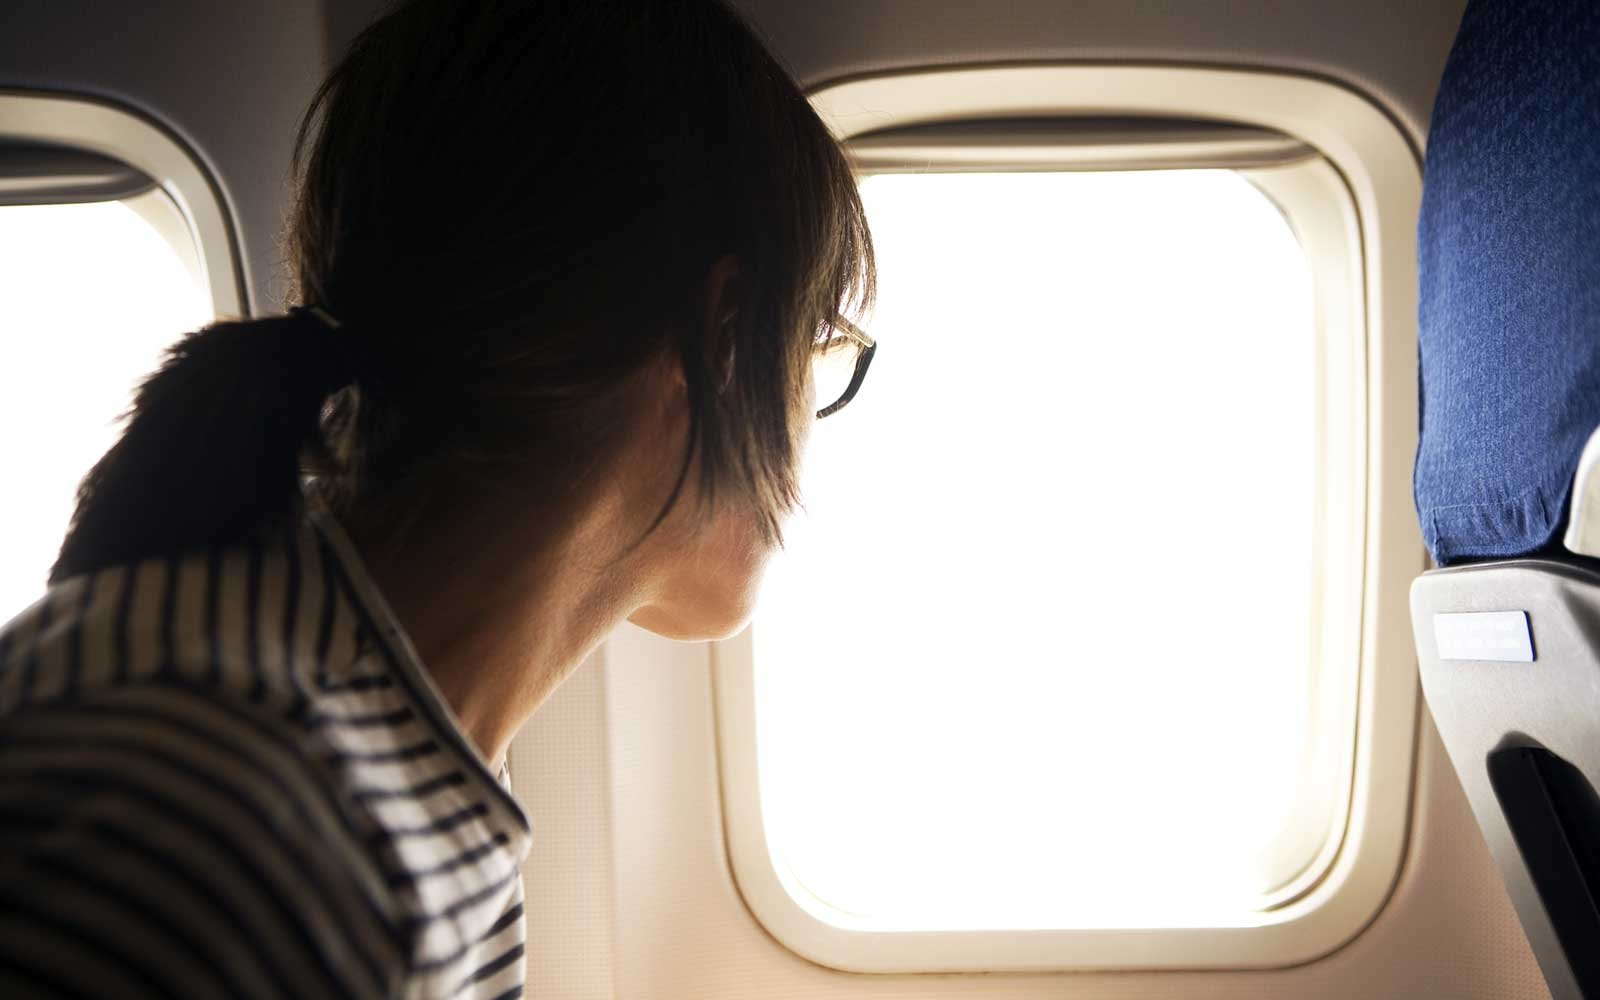 airplane-cabin-passenger-LONGFLIGHT1018.jpg